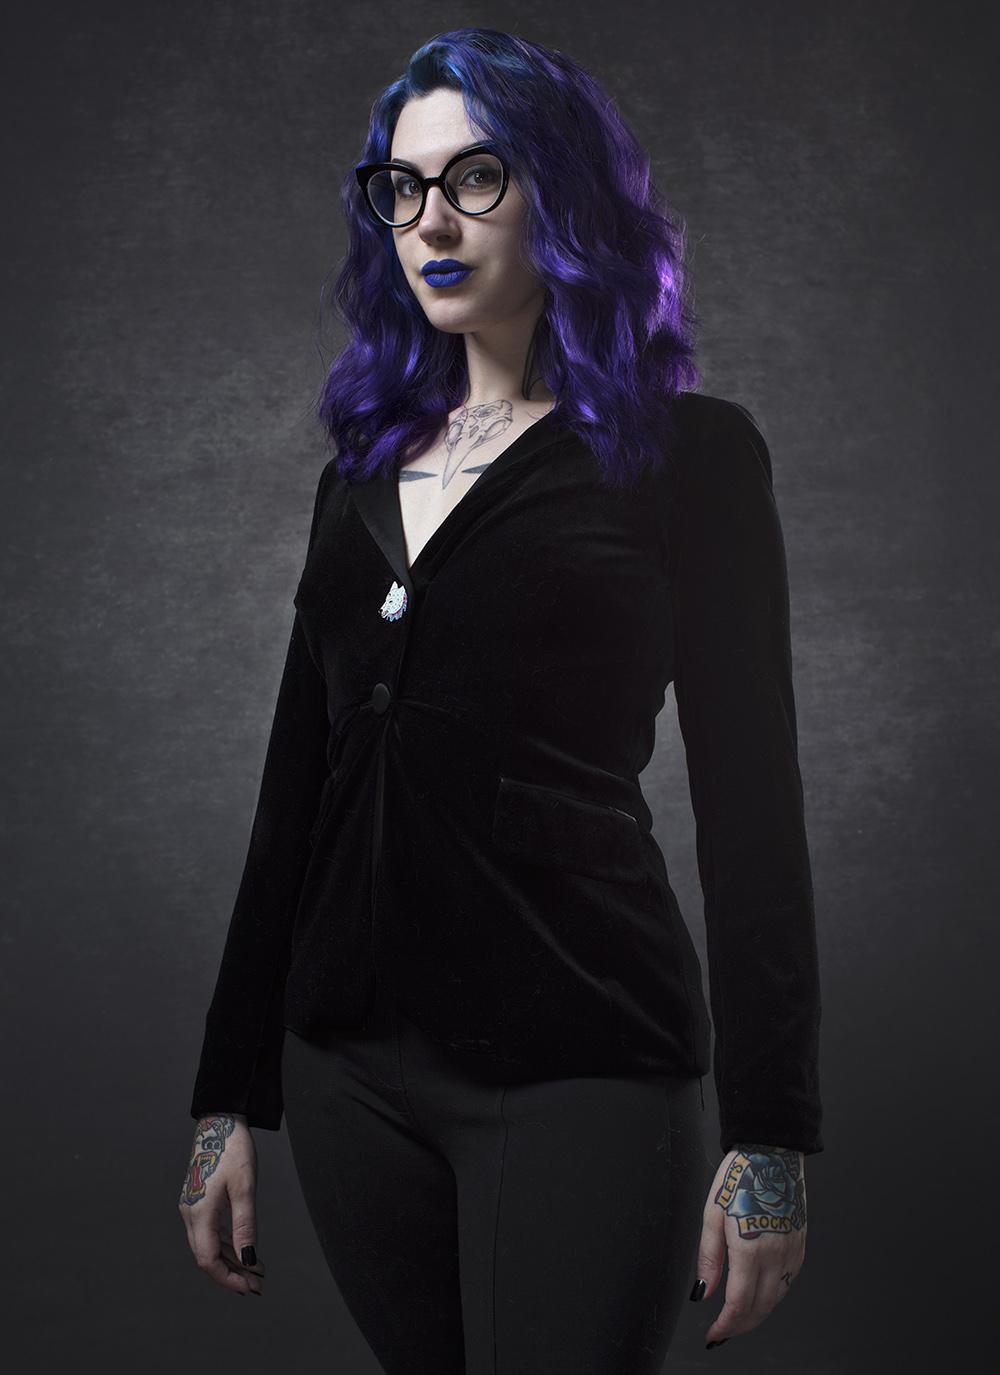 Producer / Writer Mallory O'Meara